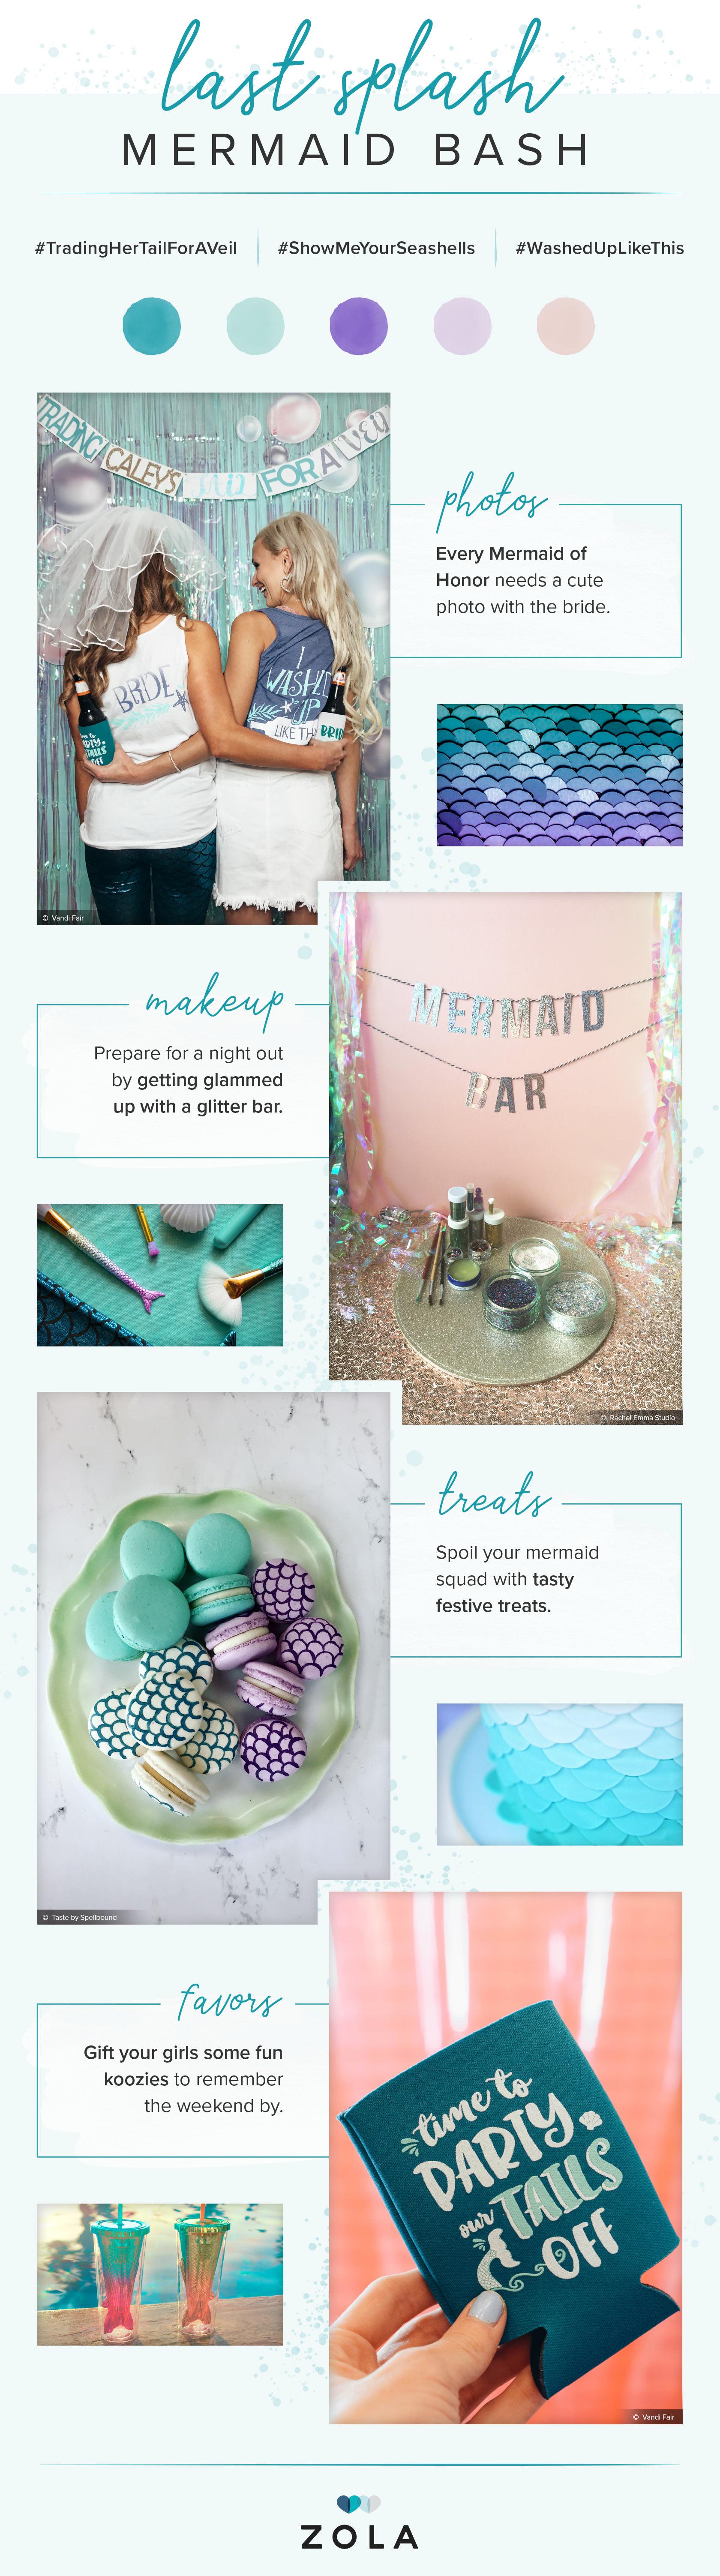 bachelorette-party-ideas-mermaid.jpg